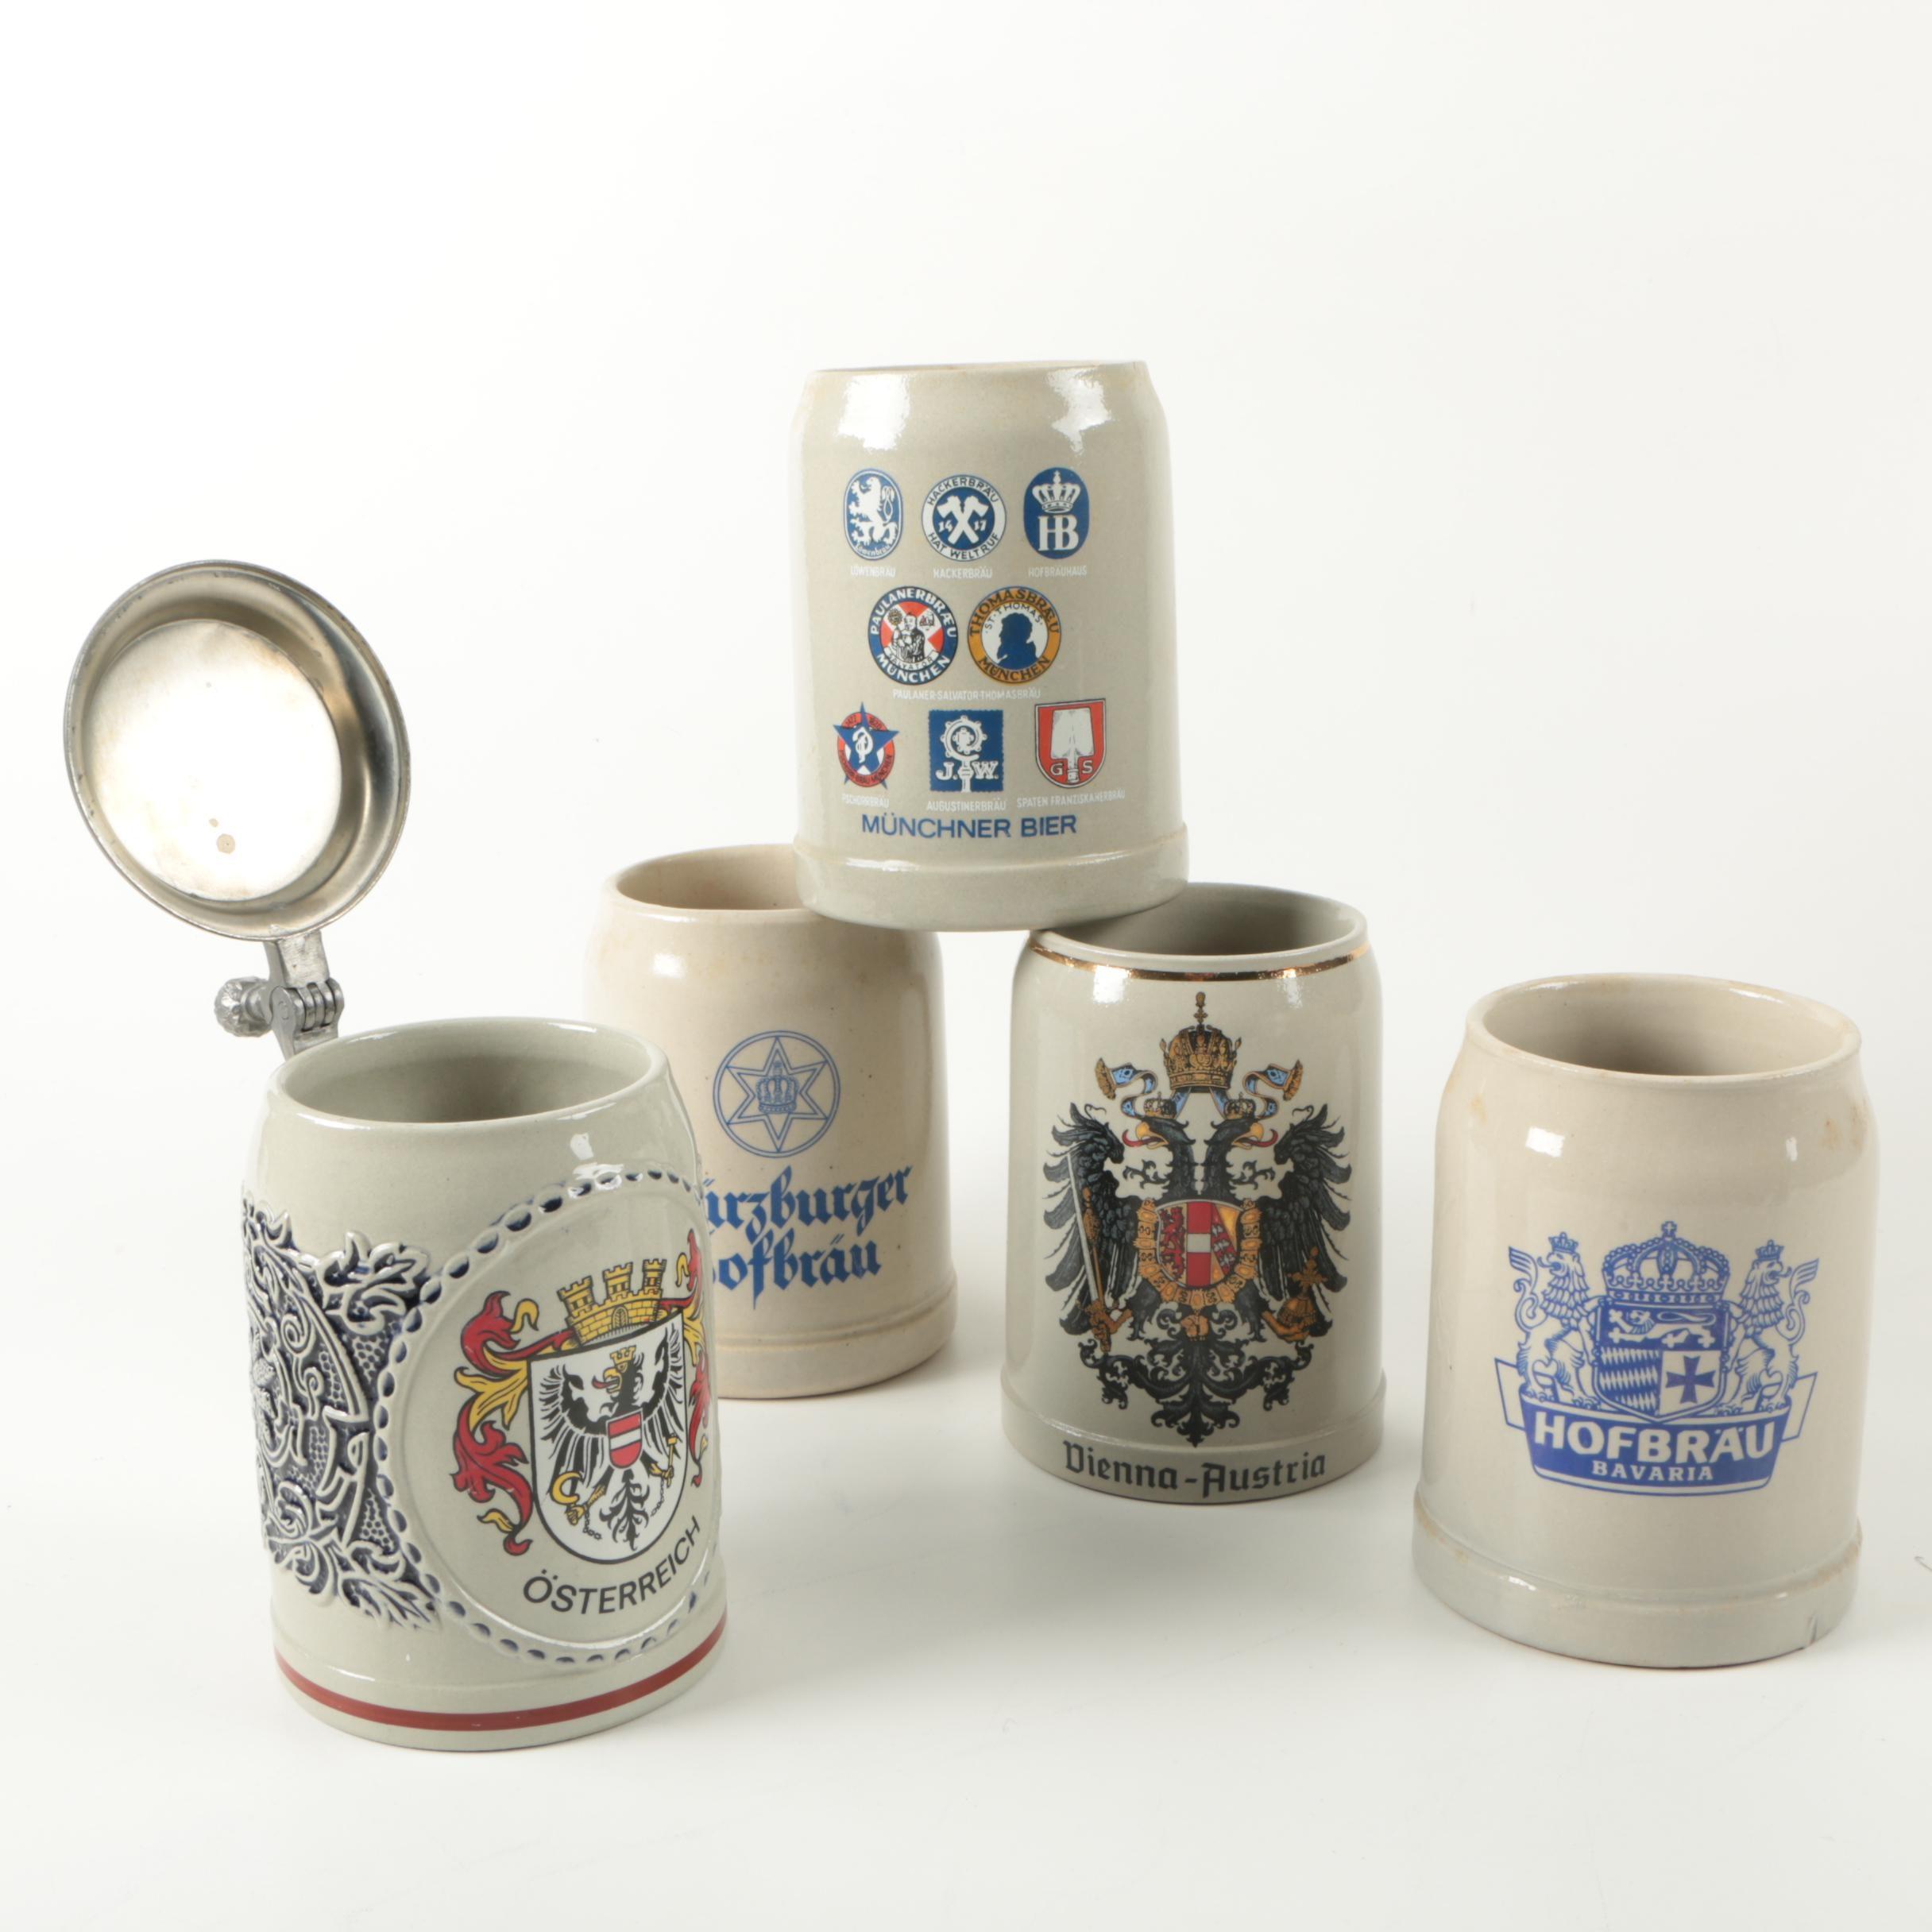 European Ceramic Beer Stein and Mugs